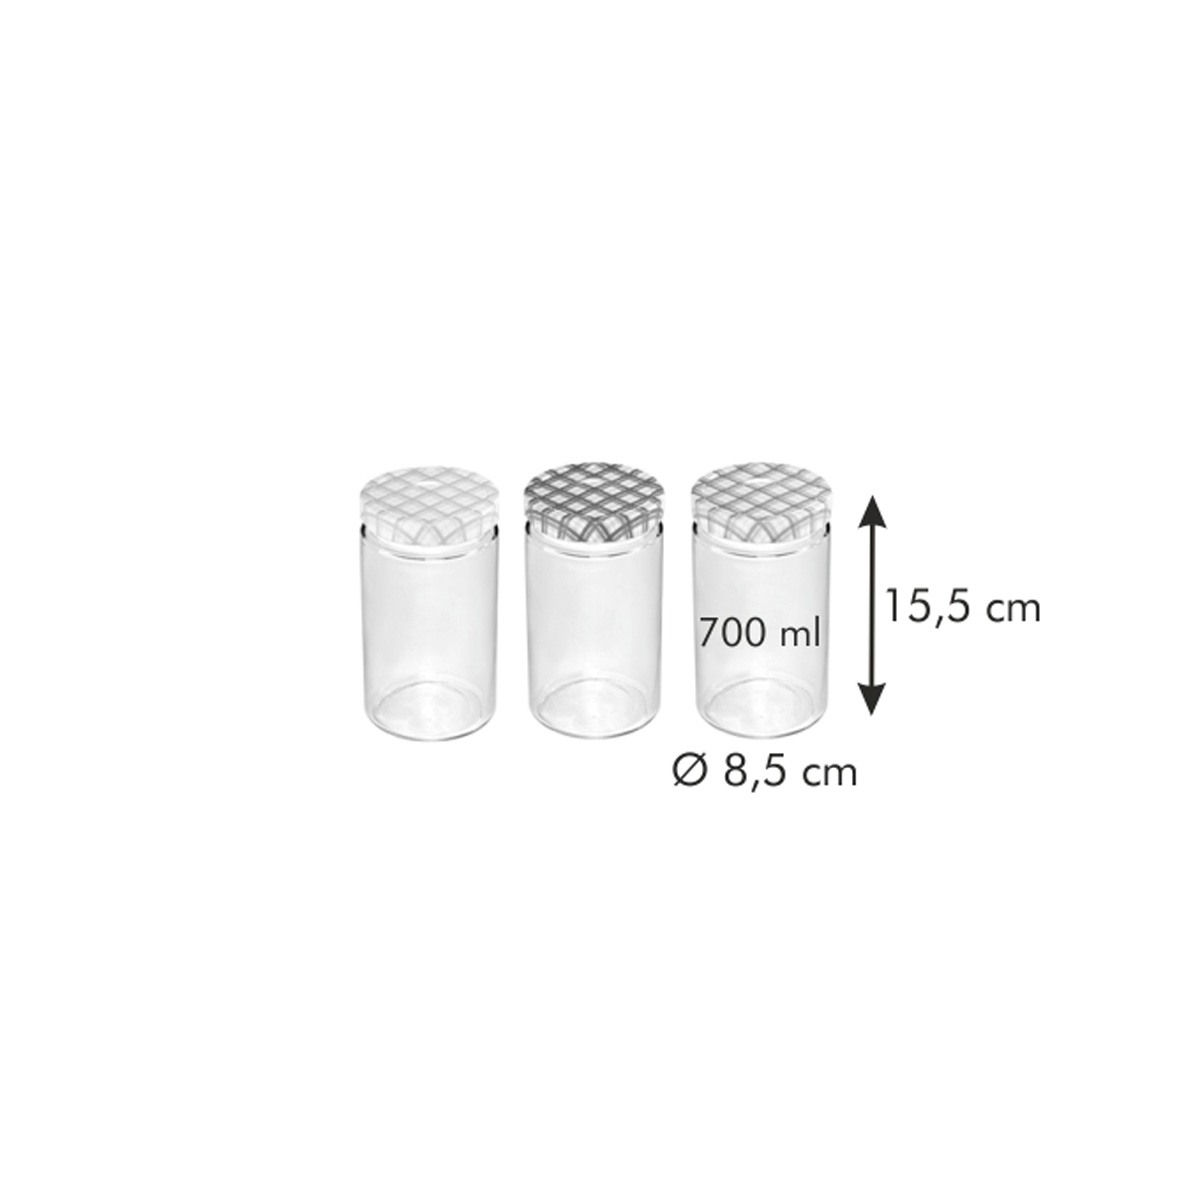 Zavařovací sklenice TESCOMA DELLA CASA 700 ml, 3 ks